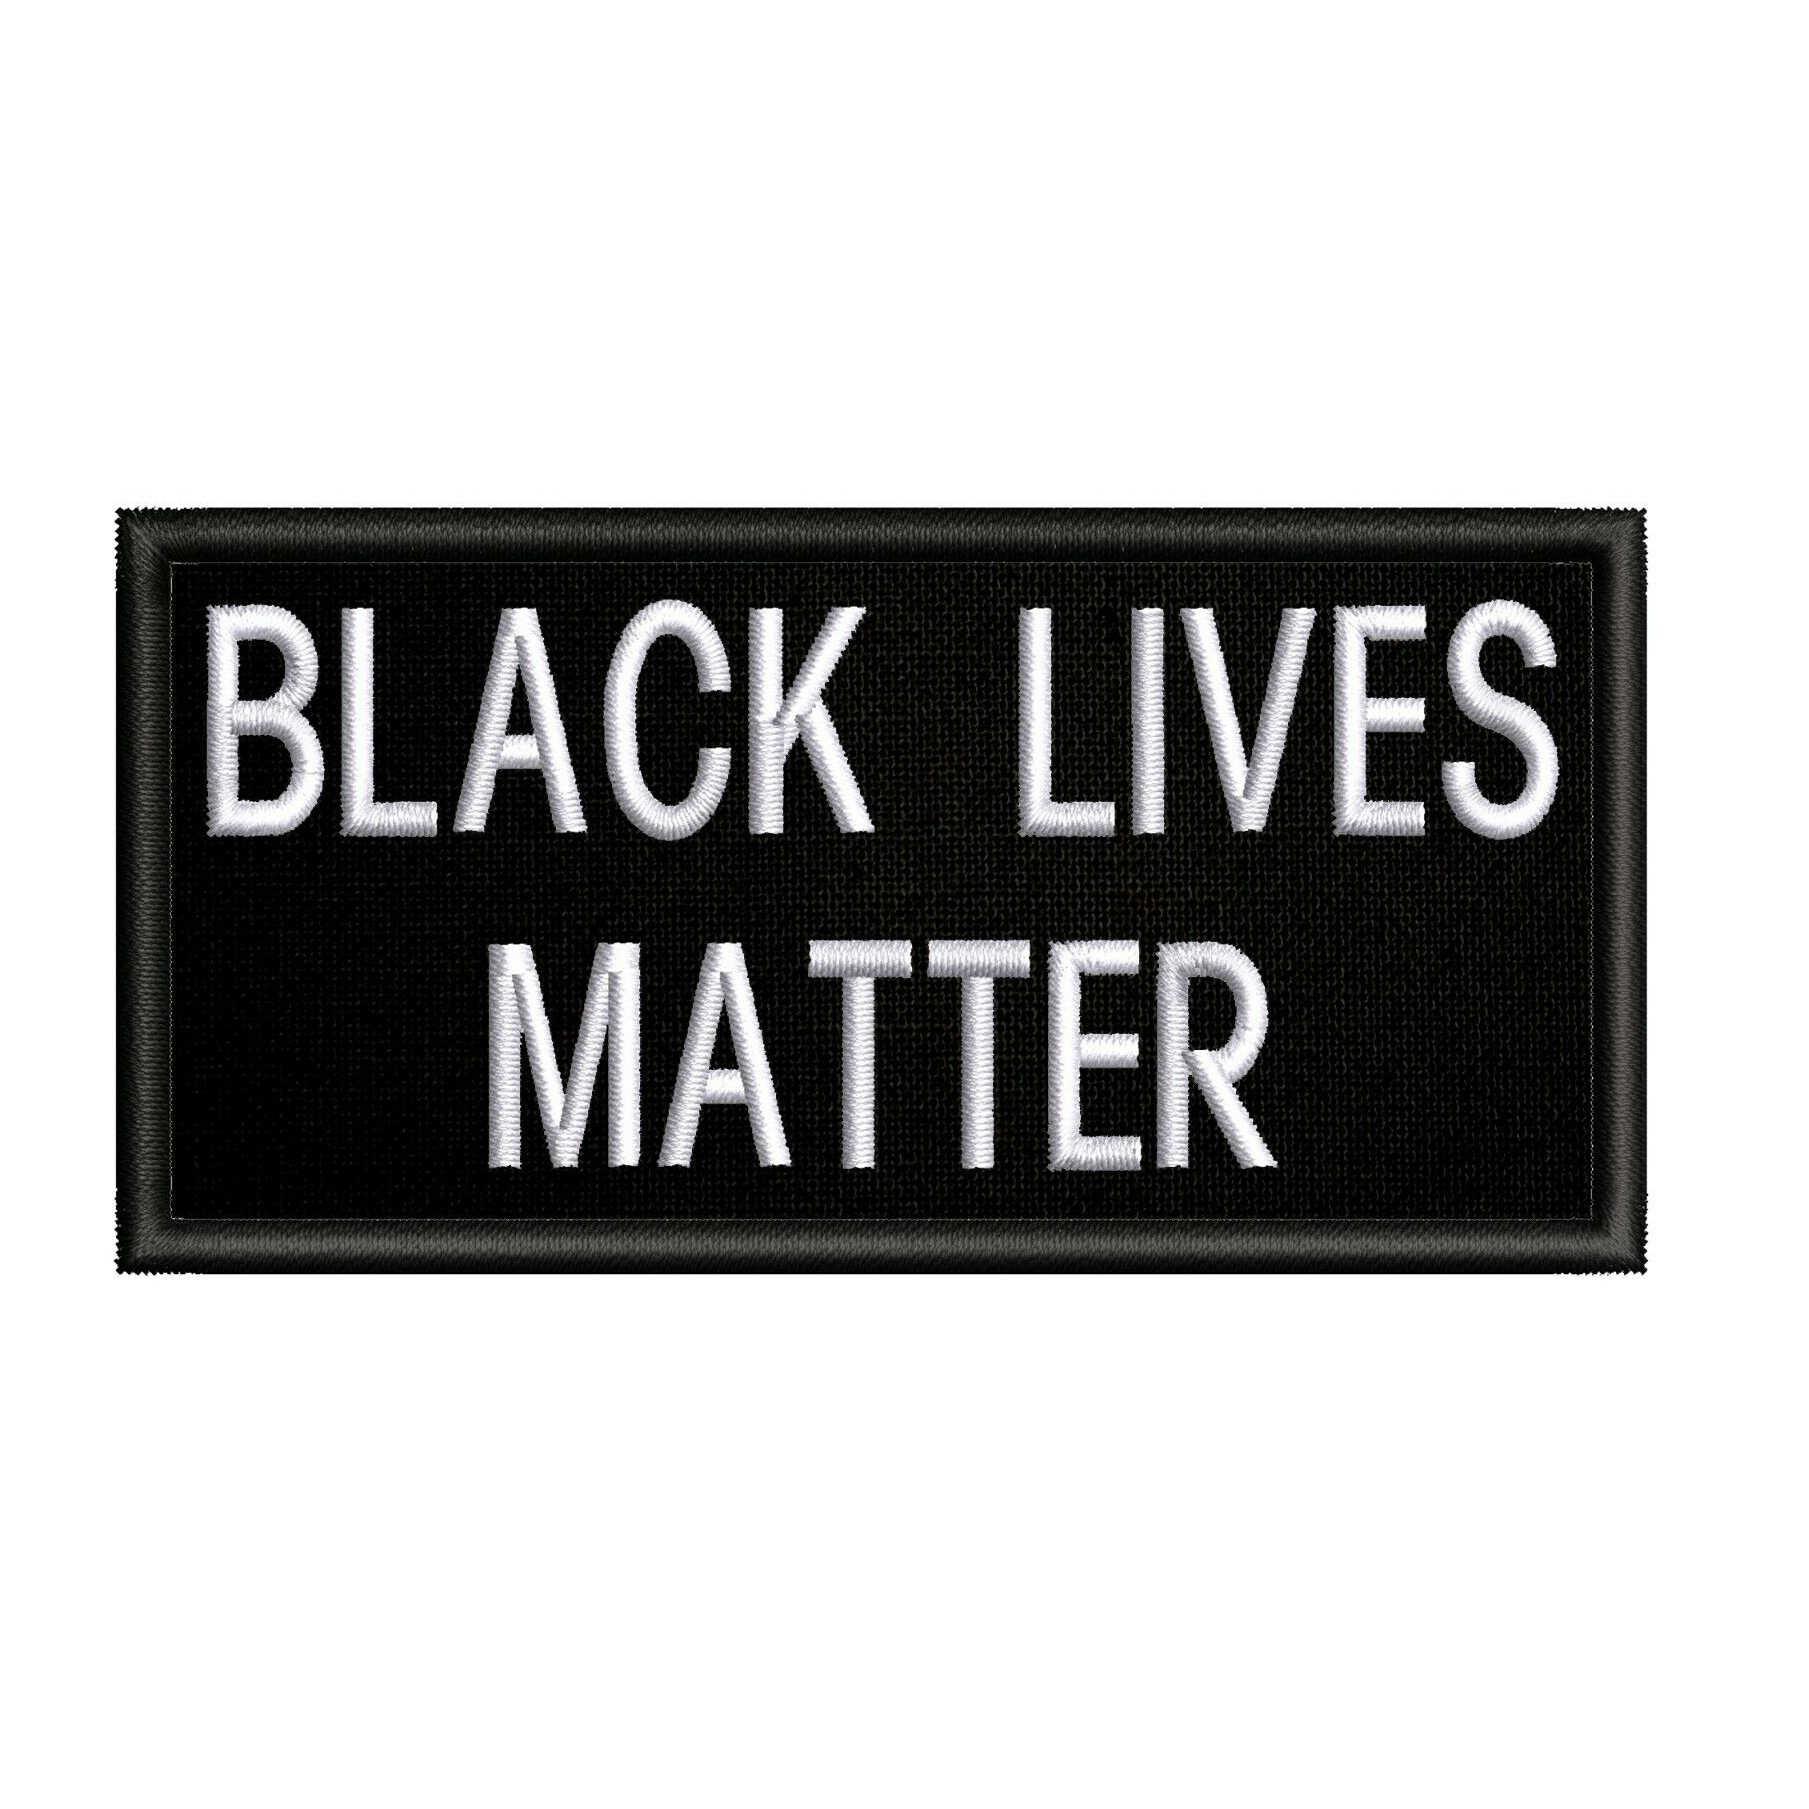 BLACKLIVESMATTER Black Lives Matter Movement Iron On Patch 1pc